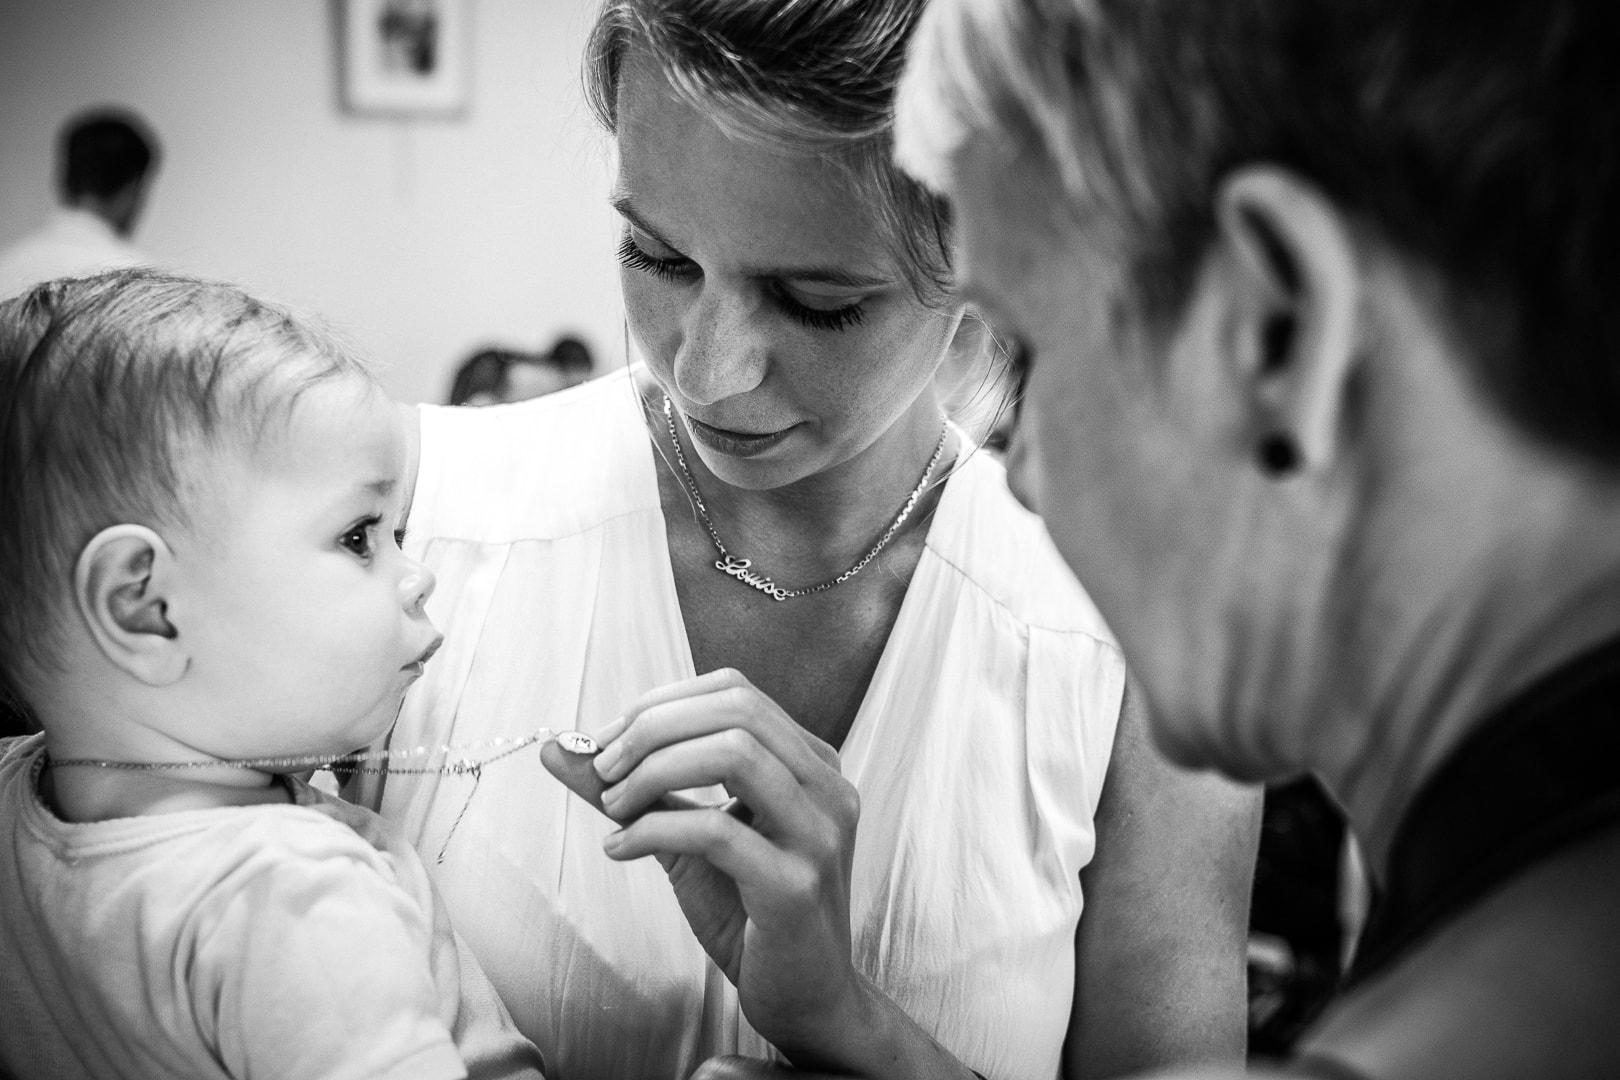 trezors-photography-photographe-professionnel-toulouse-31-famille-bapteme-lifestyle (13)